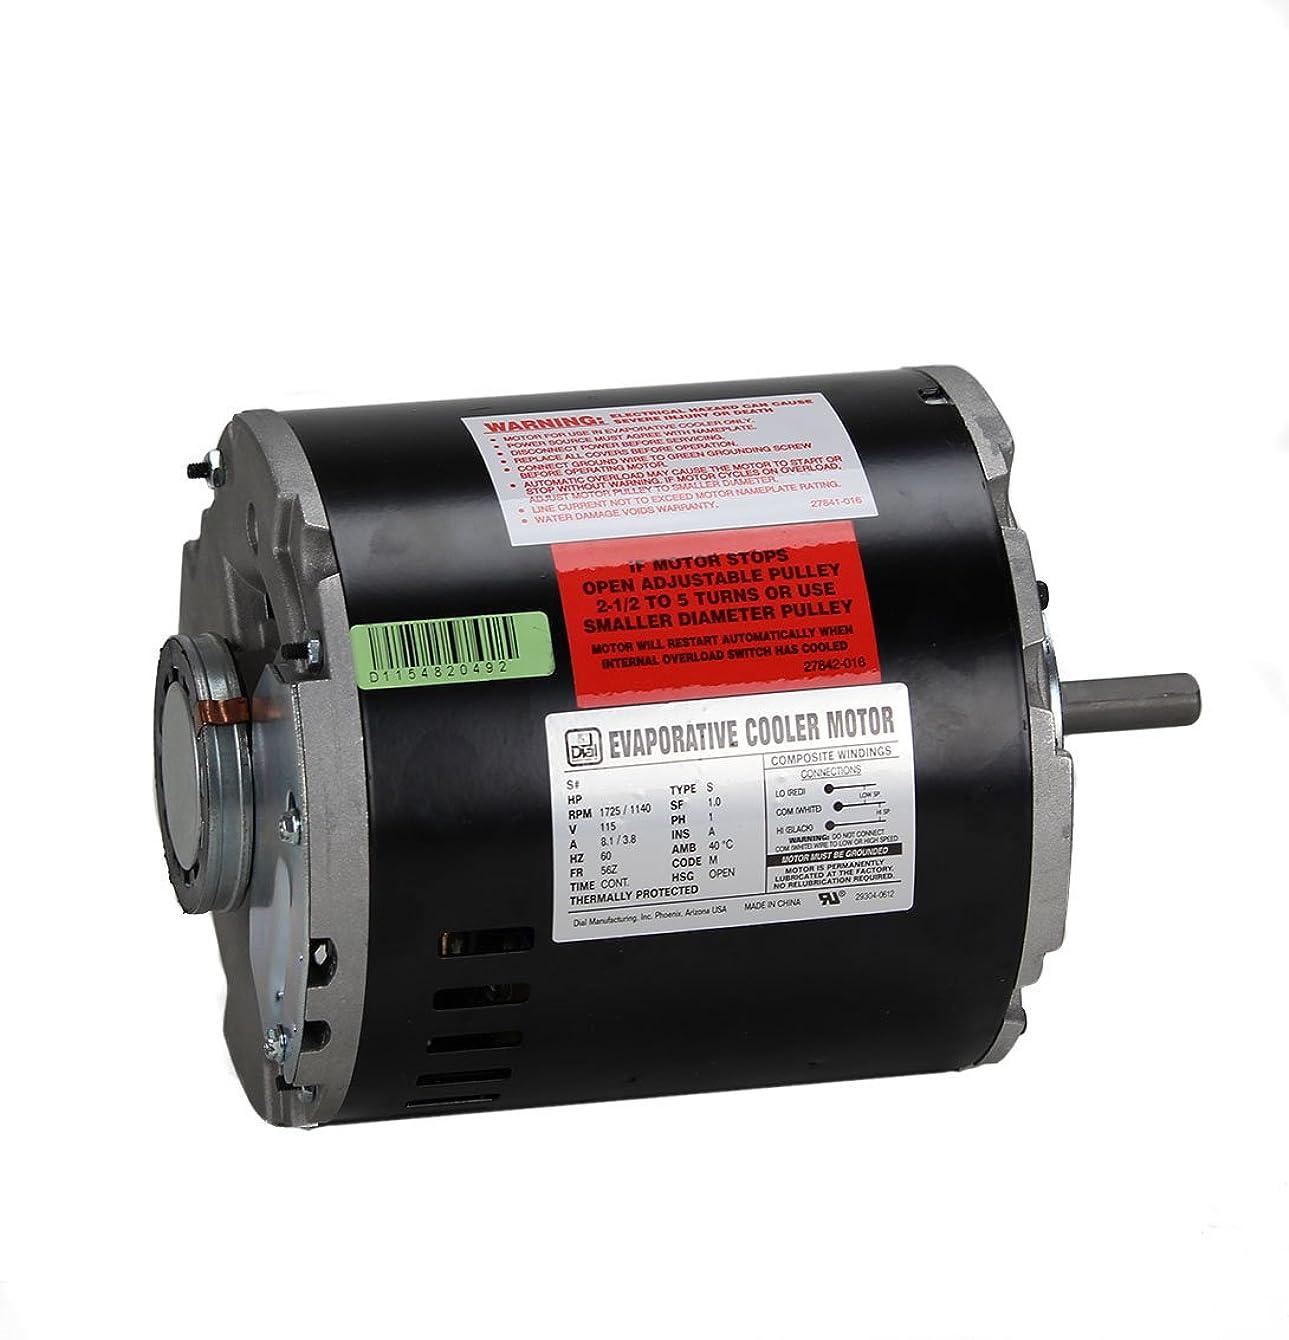 Dial Manufacturing 3/4 HP 115V 2 Speed Evaporative Cooler Motor